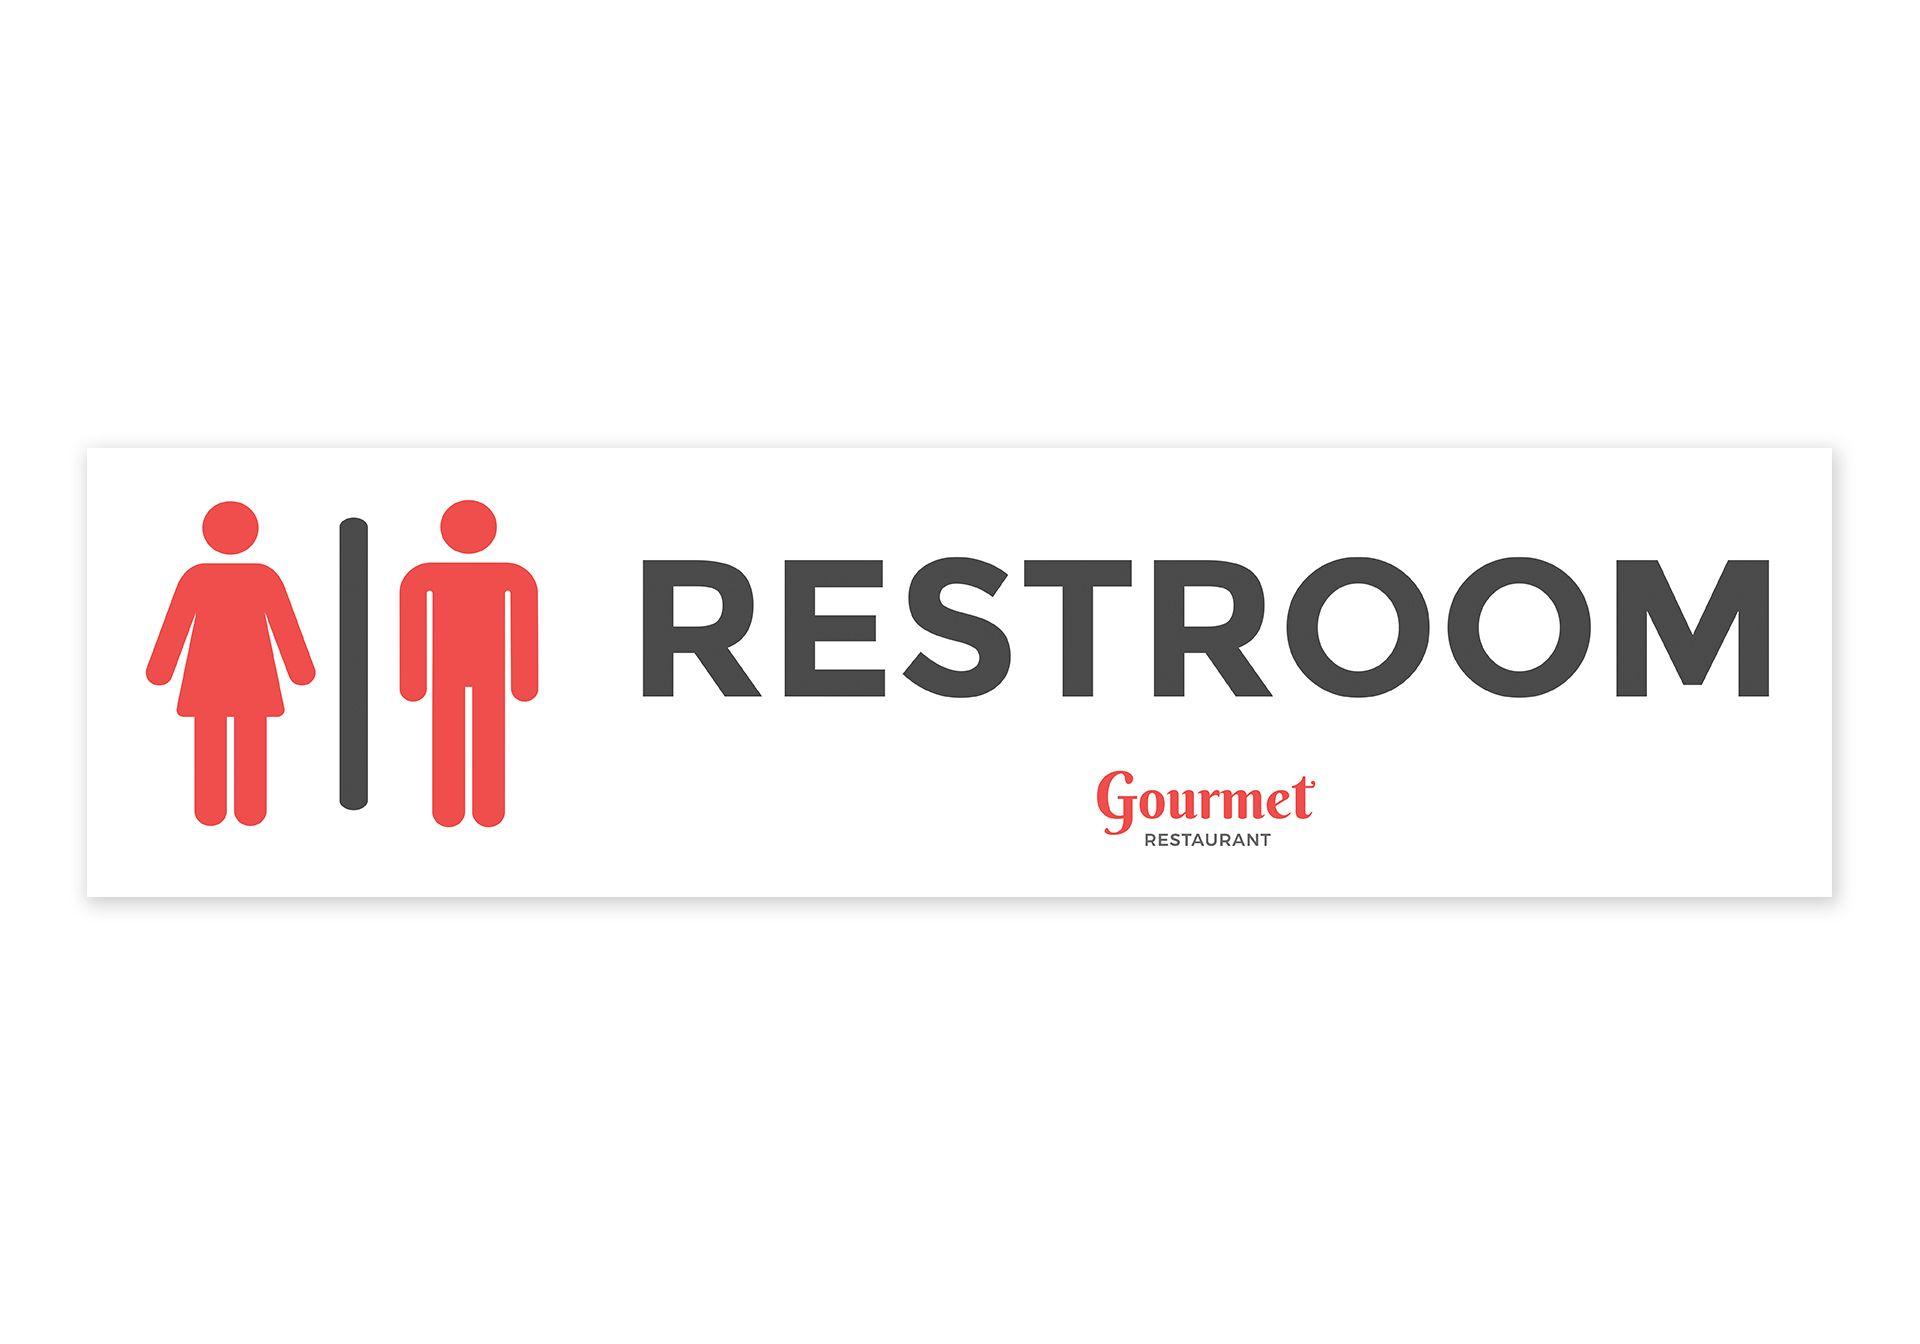 Restaurant Restroom Sign